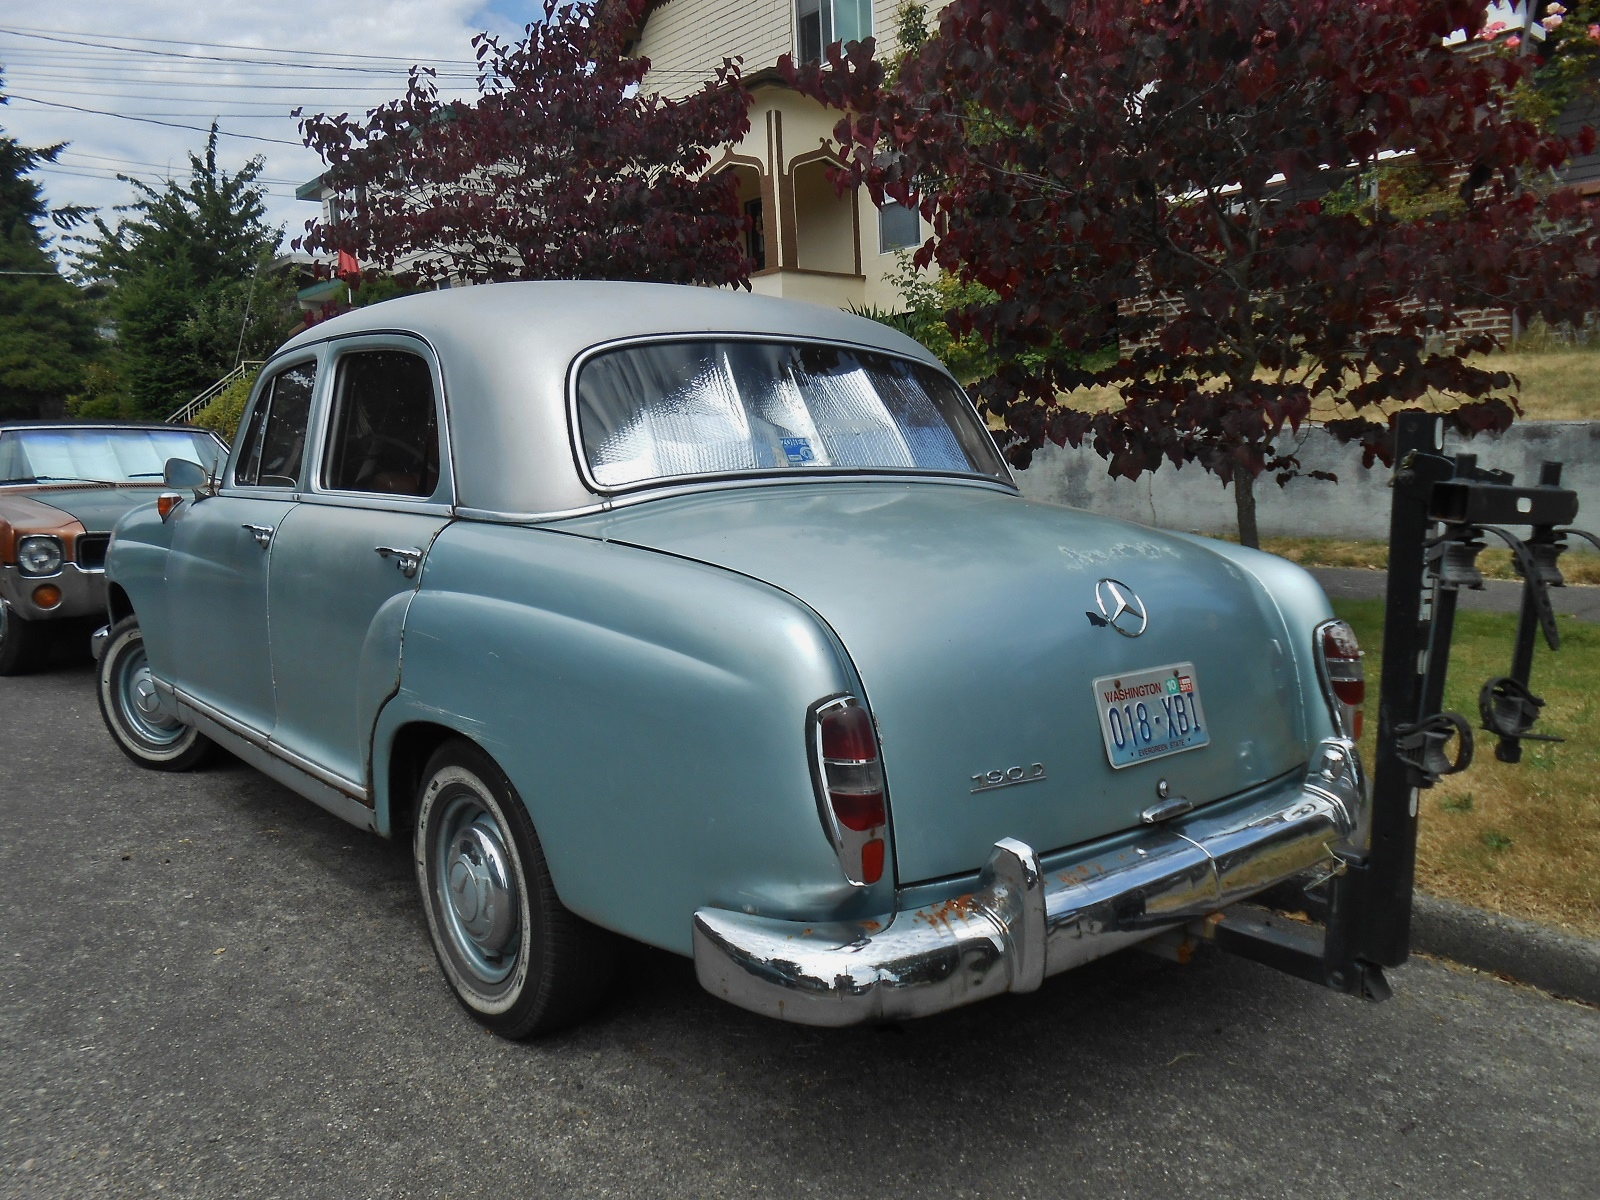 Seattle S Parked Cars 1960 Mercedes 190d